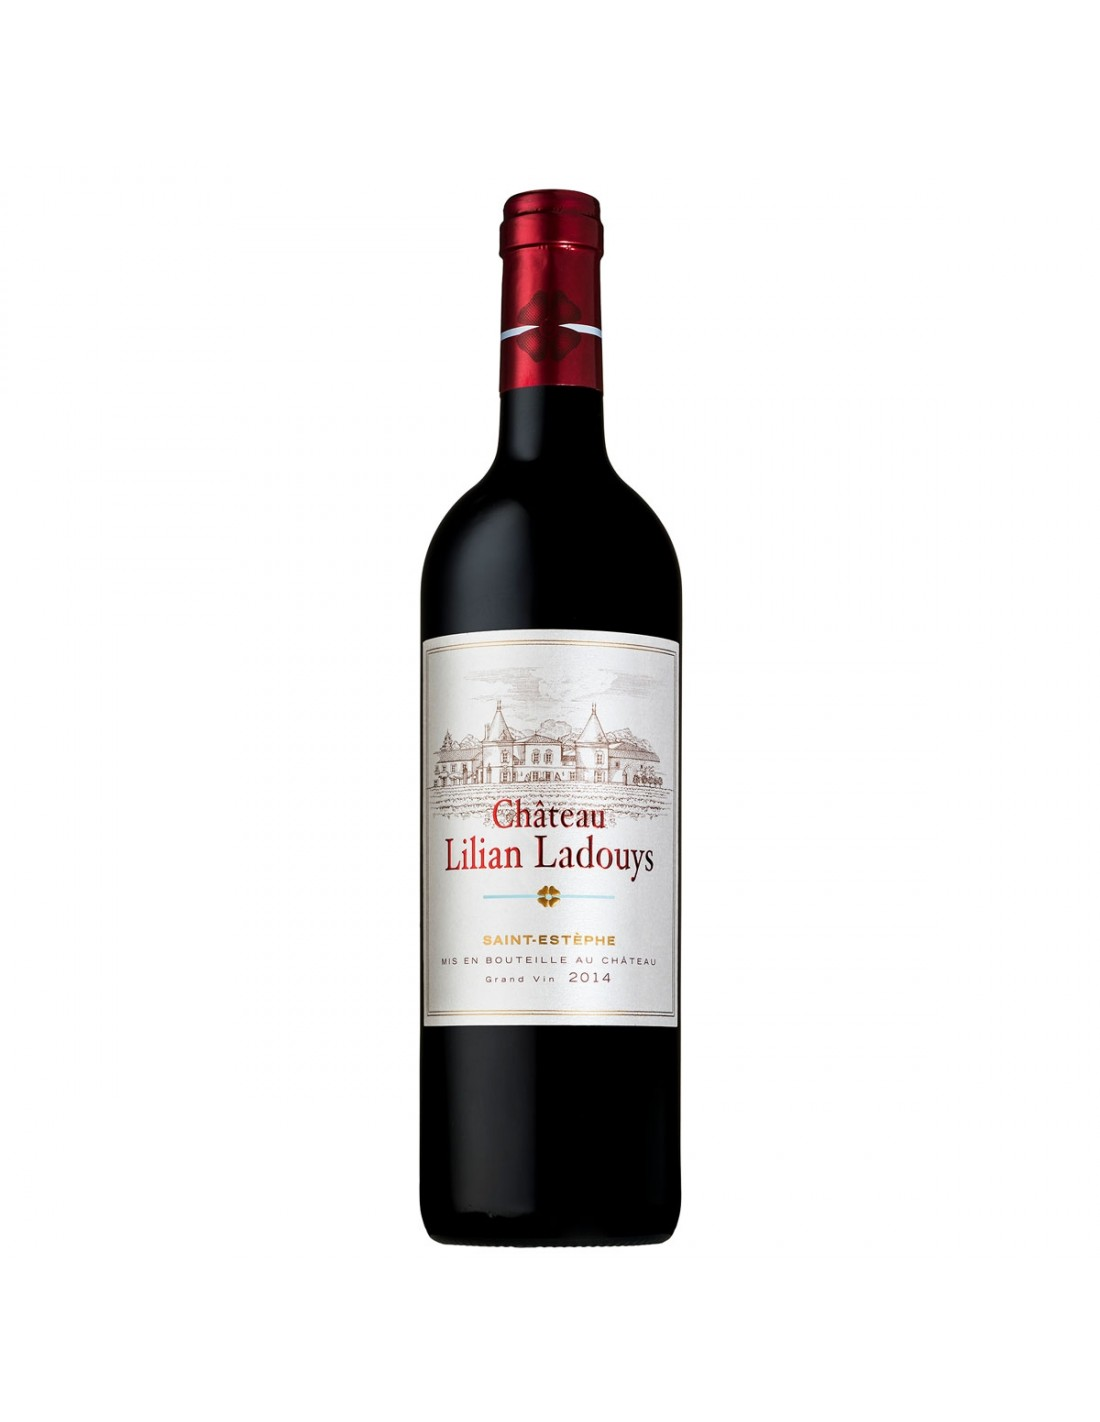 Vin rosu, Chateau Lilian Ladouys Saint-Estephe, 0.75L, 13.5% alc., Franta